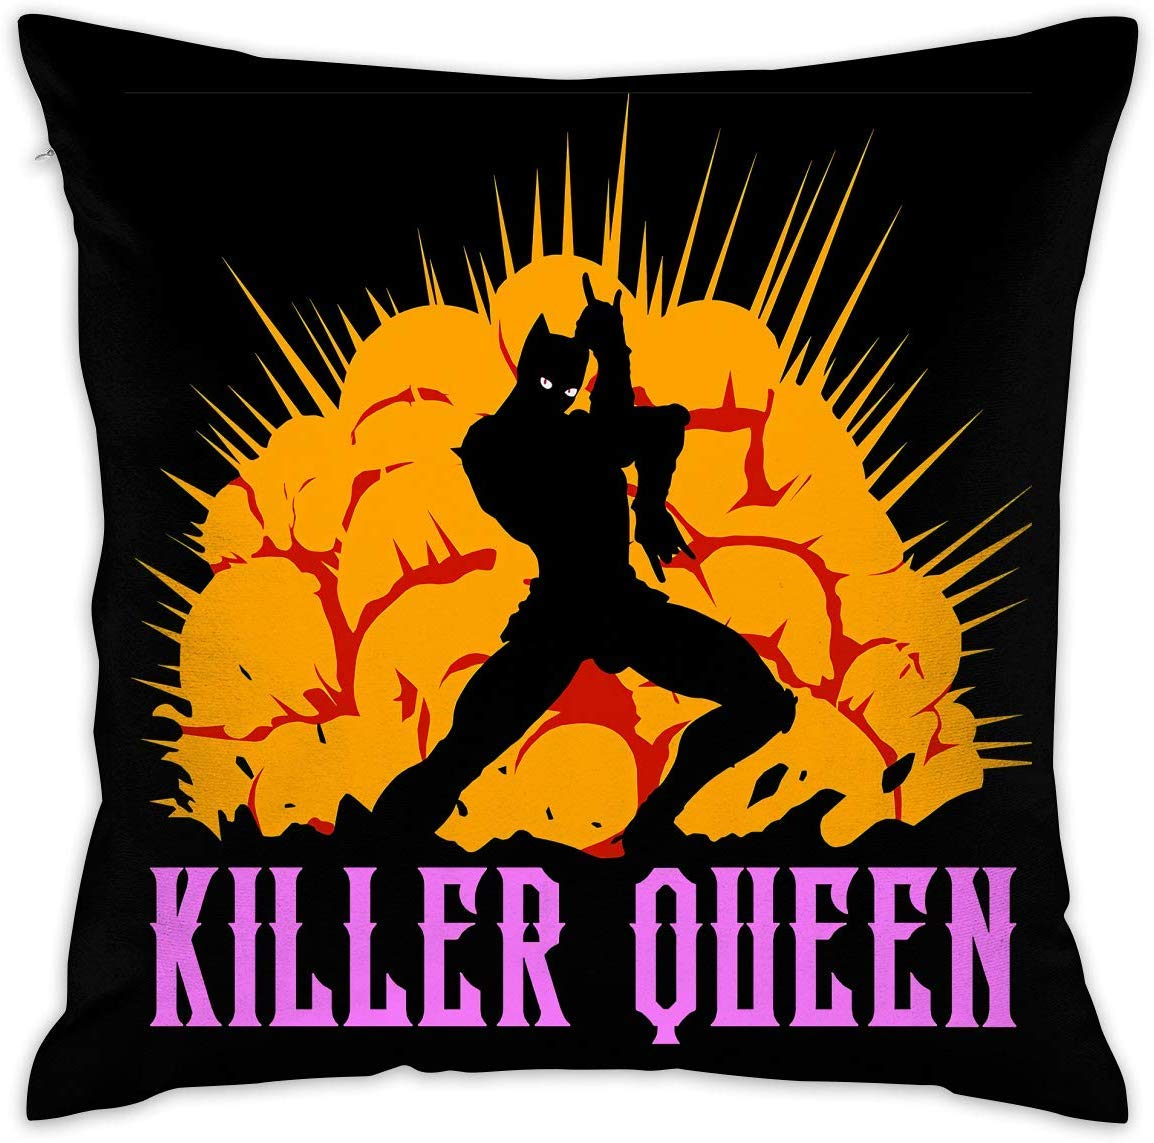 Zahhdasd JoJos Bizarre Adventure Decorative Cushion Cover Pillow Covers Case Pillowcases26 X 26 inch